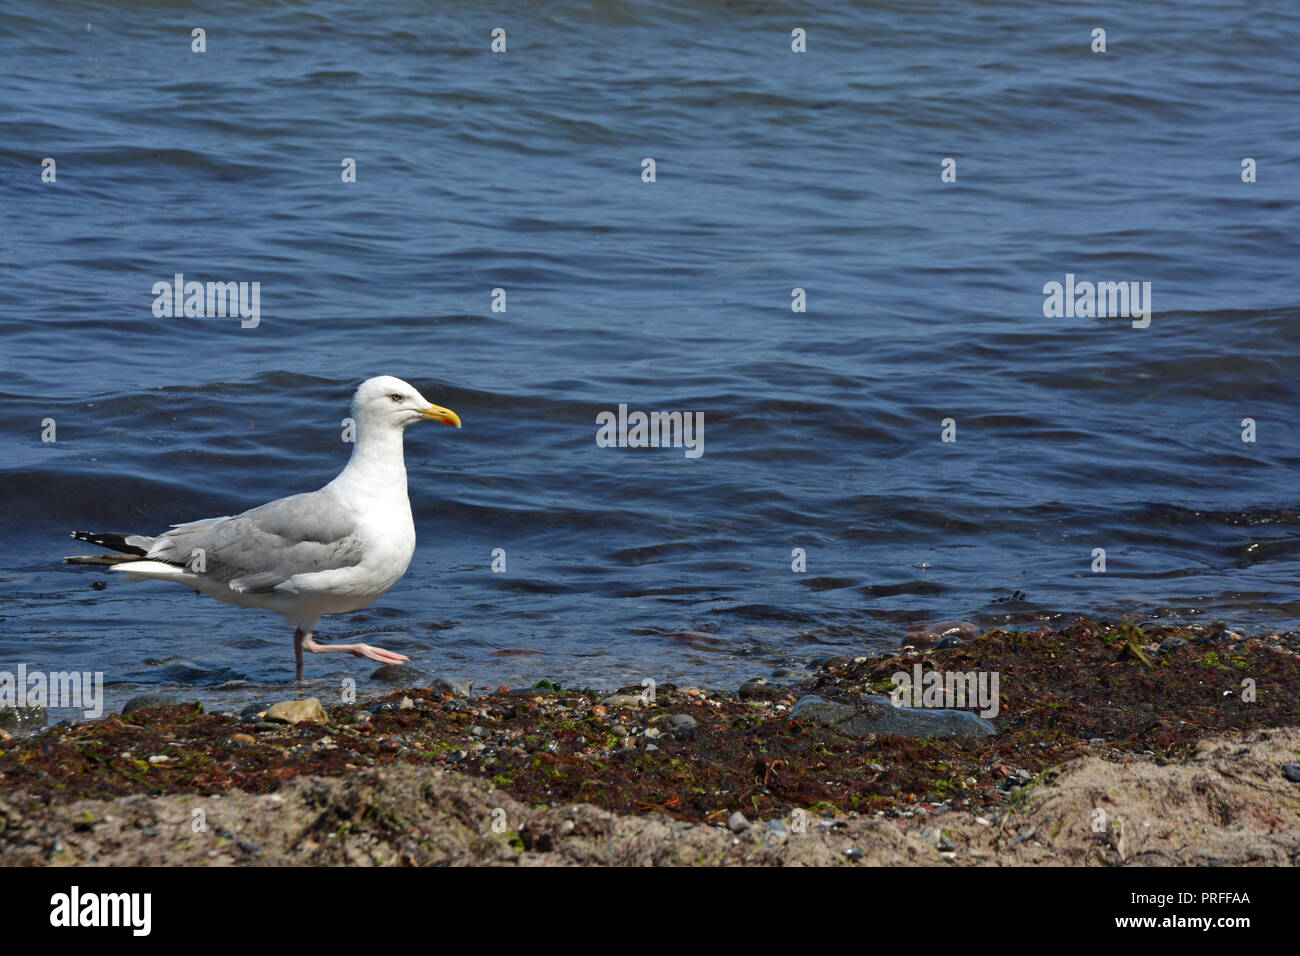 Möve   Meer   Hintergrund - Stock Image